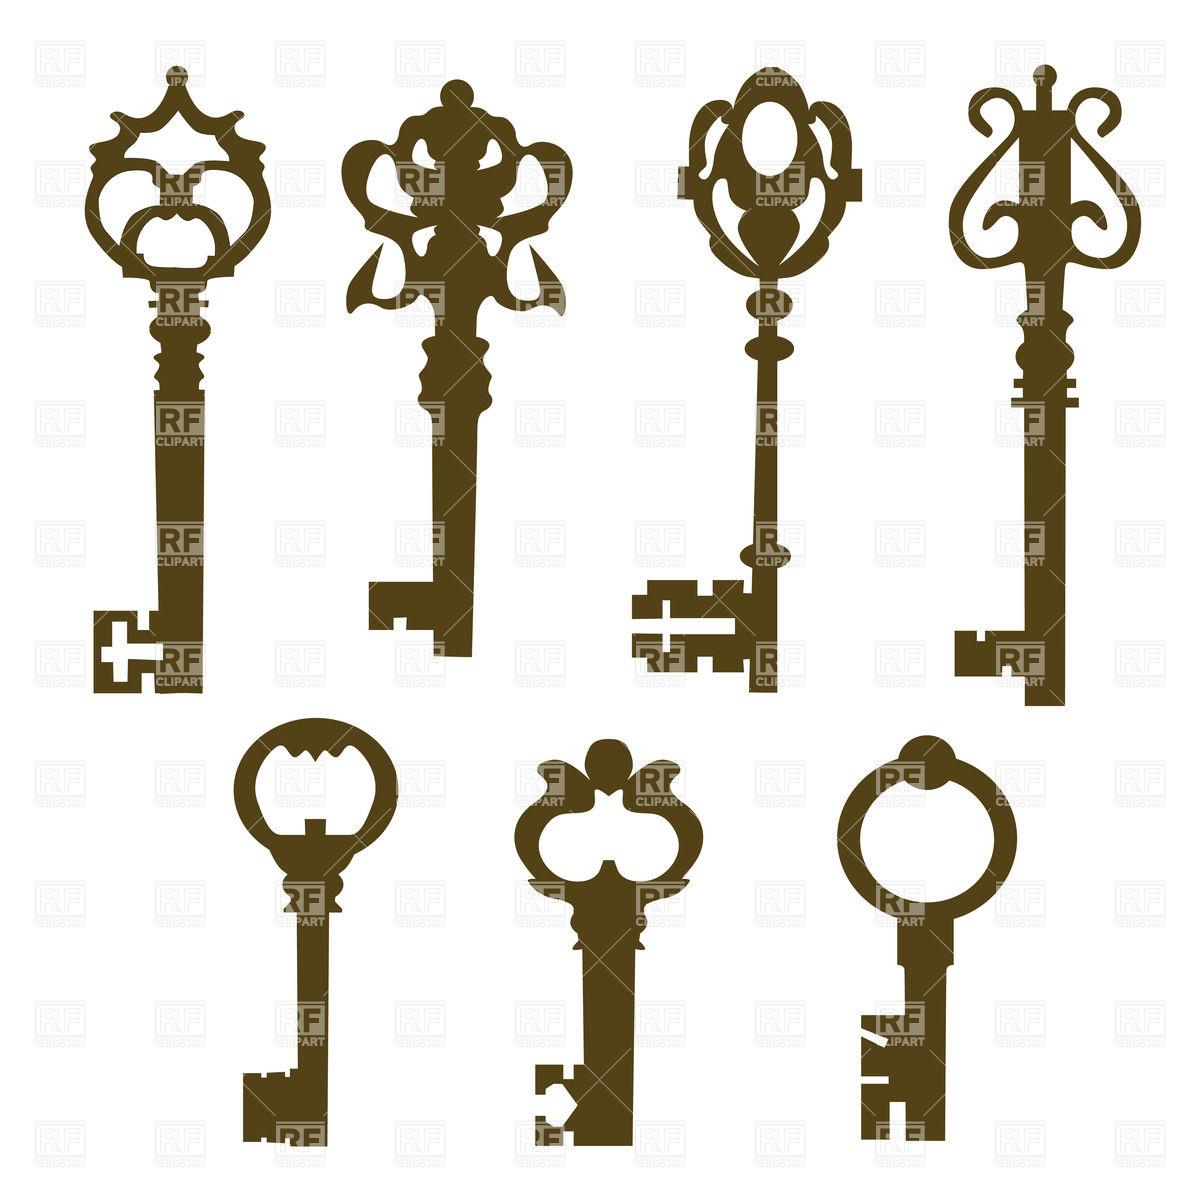 Silhouettes of vintage elegant door keys with ornate, beautiful.